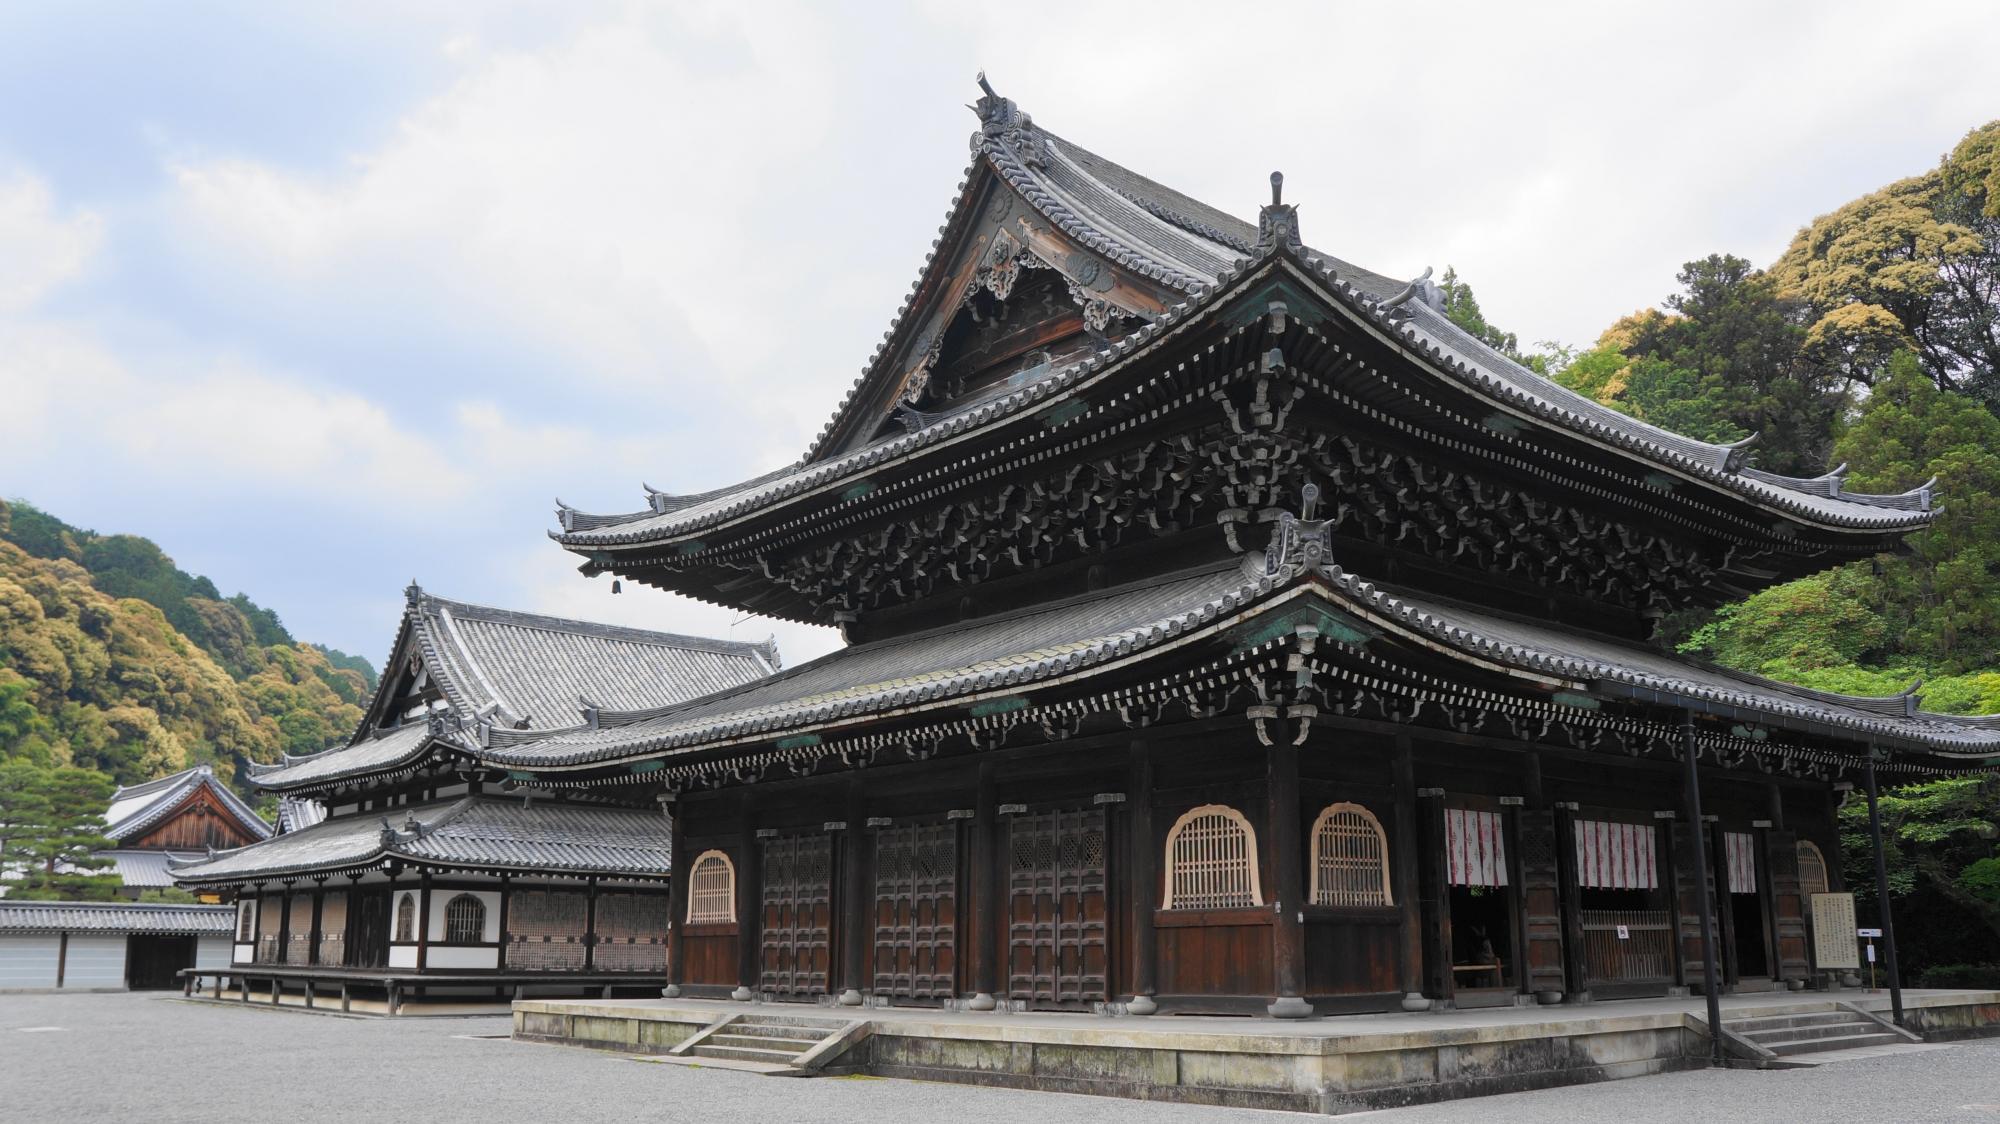 京都御寺泉涌寺の雄大な仏殿と舎利殿